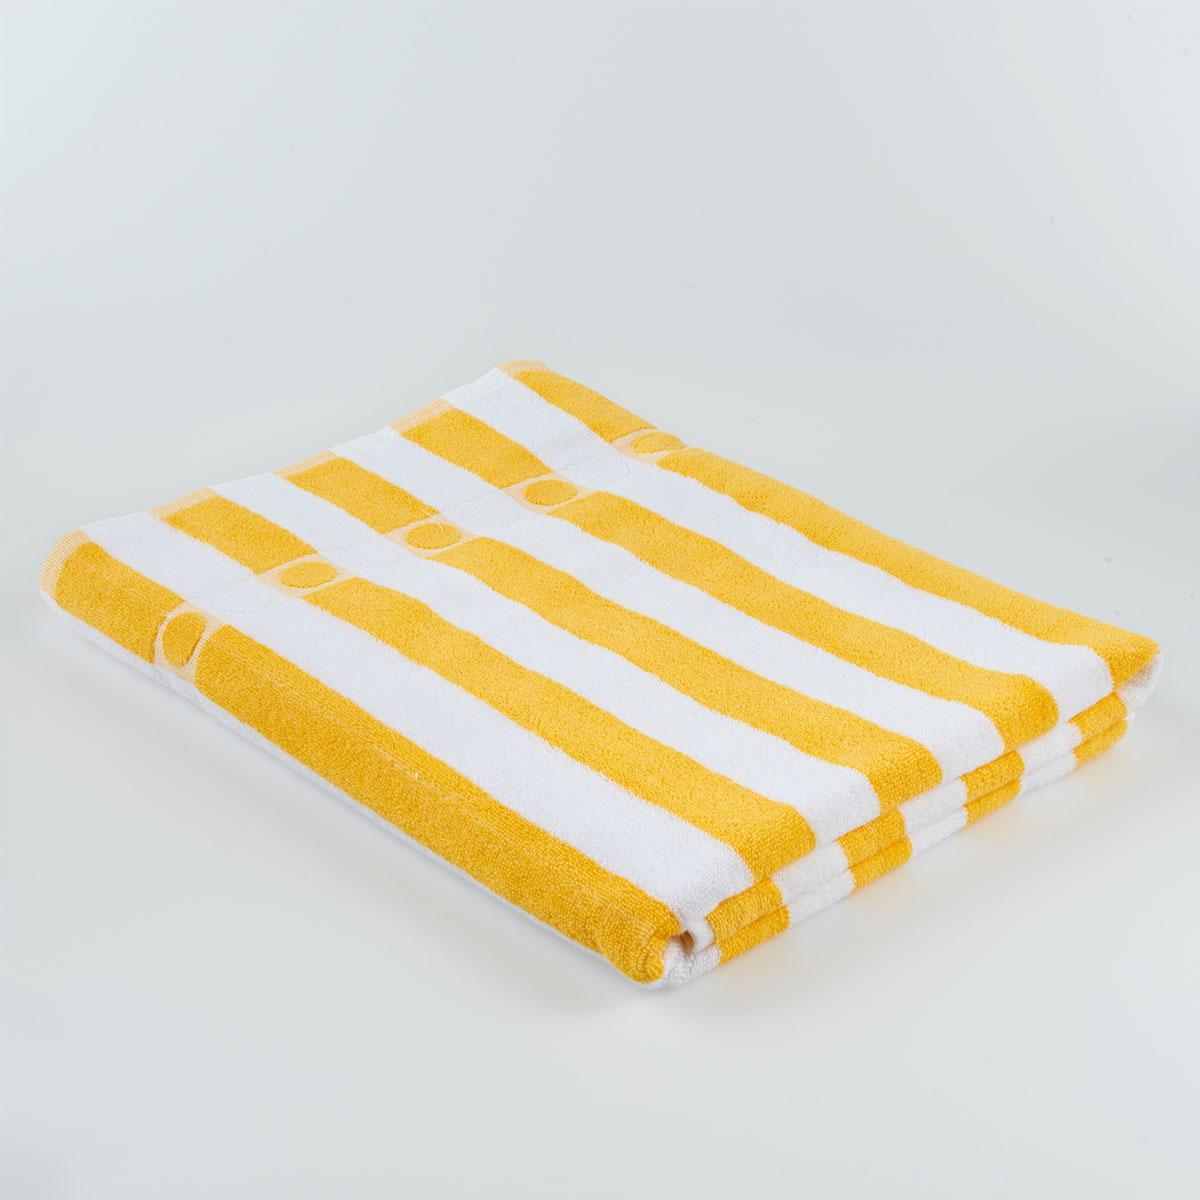 drap de plage piscine bali ray standard textile. Black Bedroom Furniture Sets. Home Design Ideas